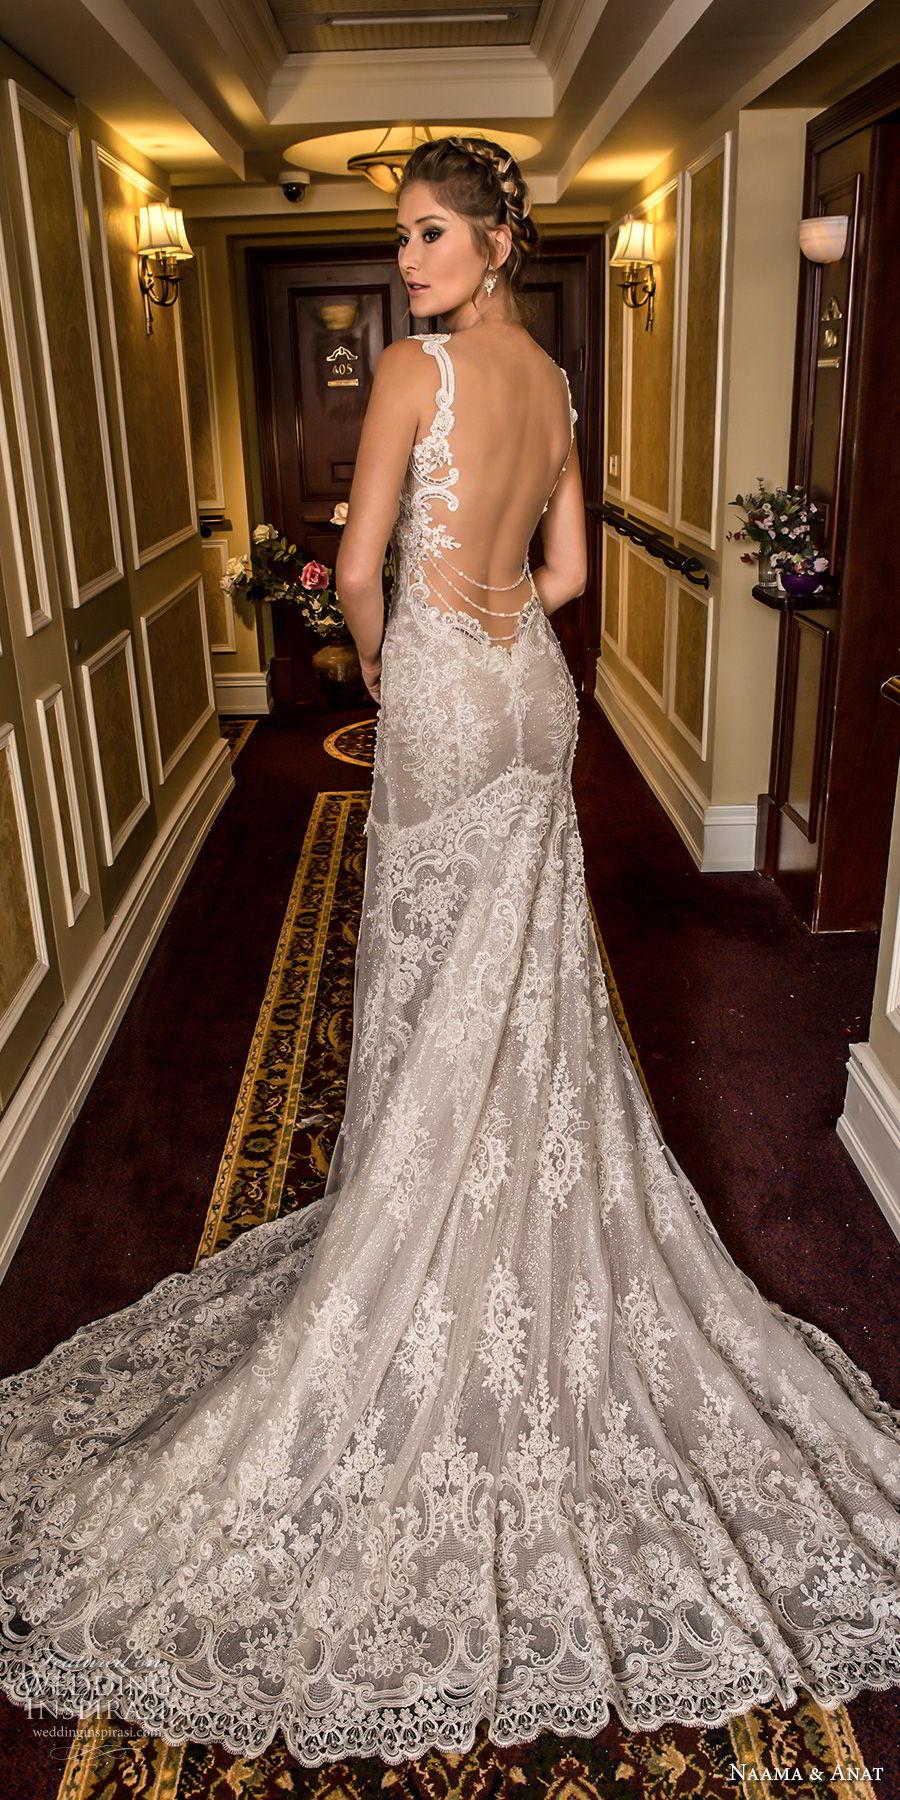 naama and anat fall 2018 bridal cap sleeves deep plunging sweetheart neckline full embellishment elegant trumpet wedding dress low open back medium train (2) bv